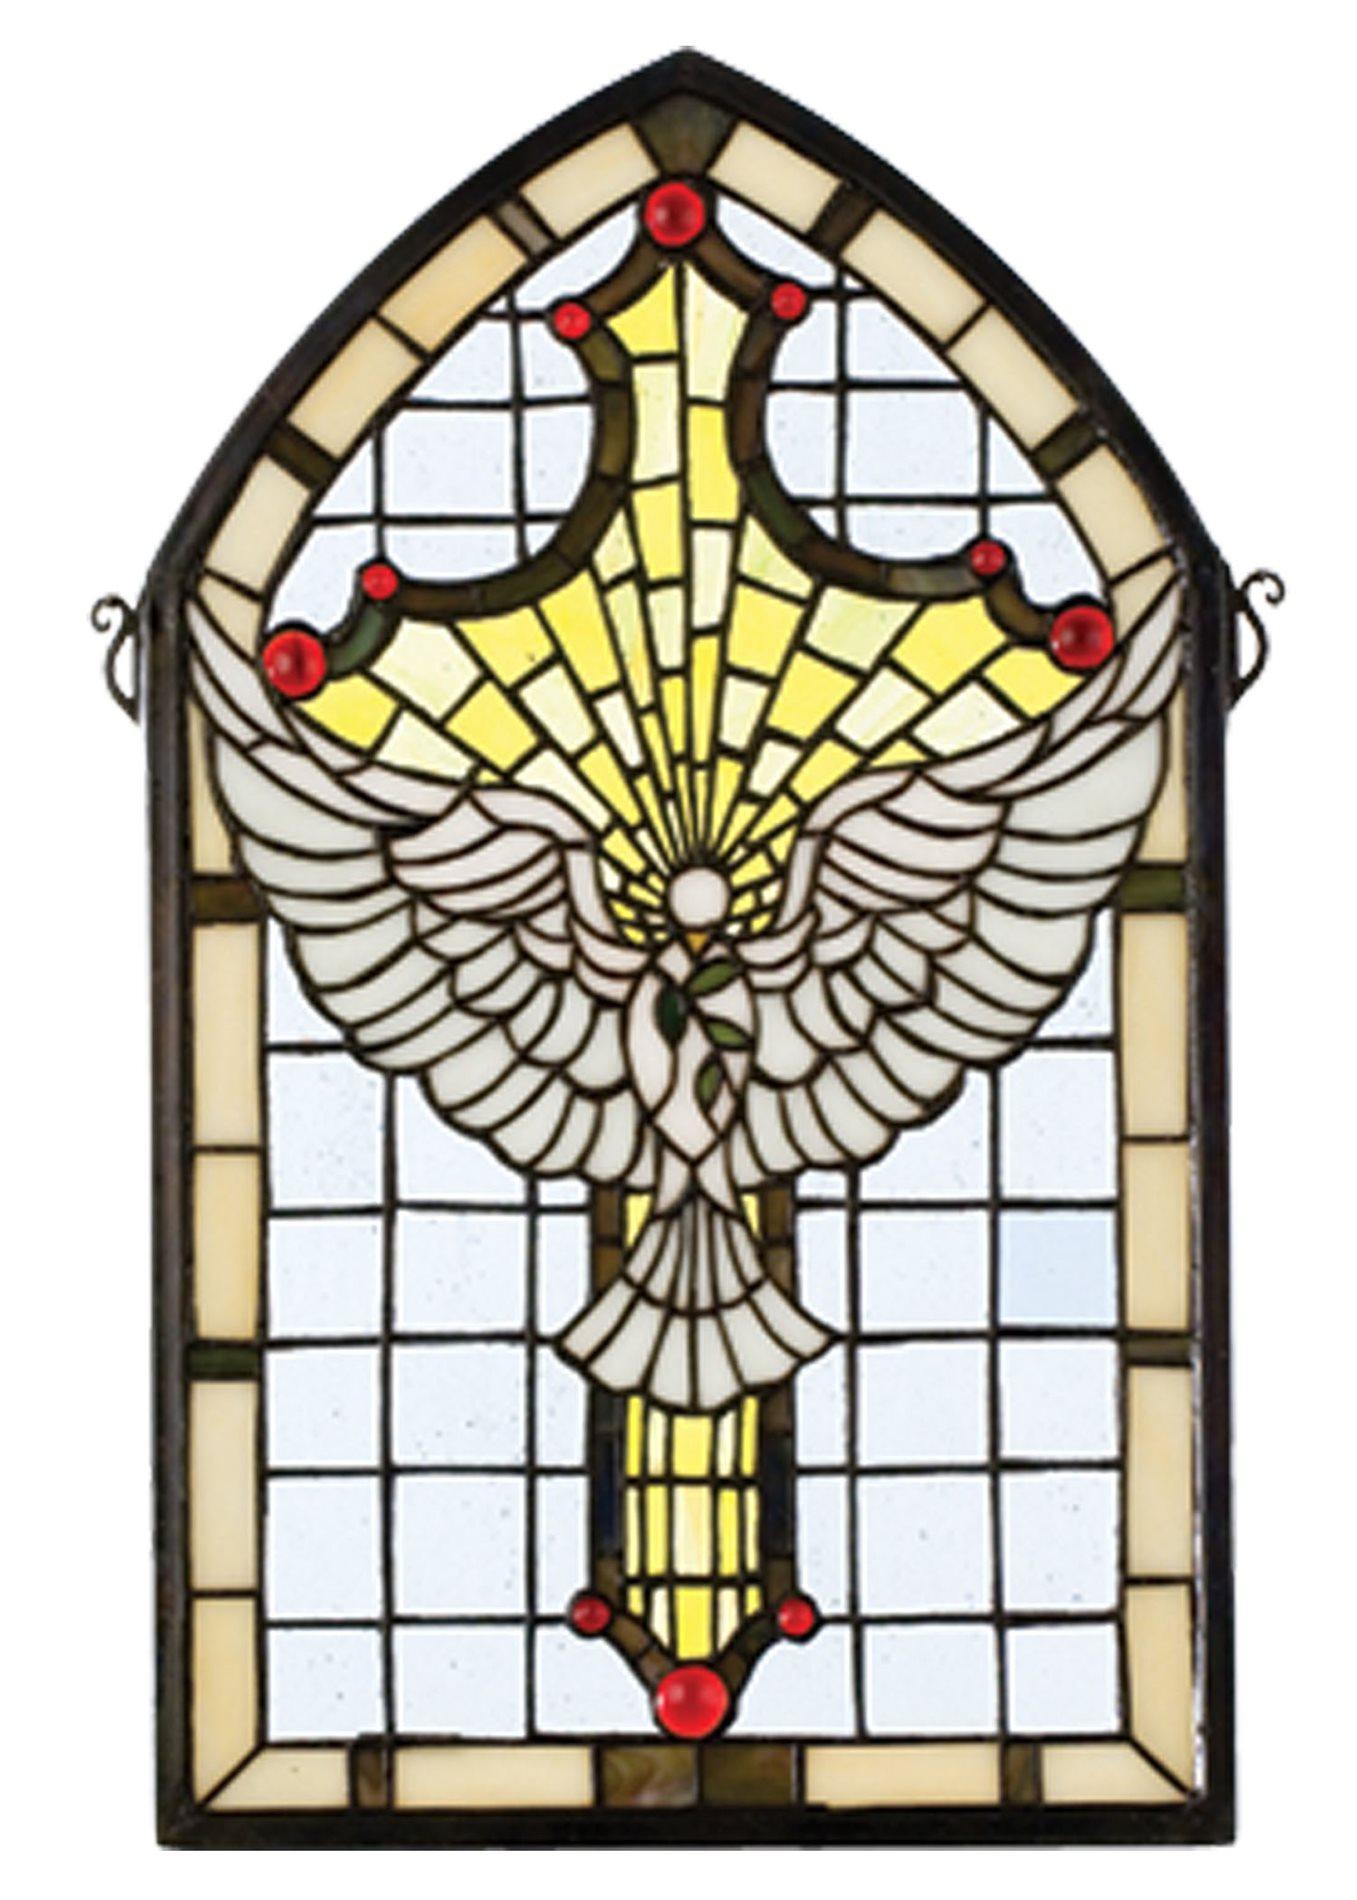 Meyda Tiffany 23249 Dove Cross Stained Glass Tiffany